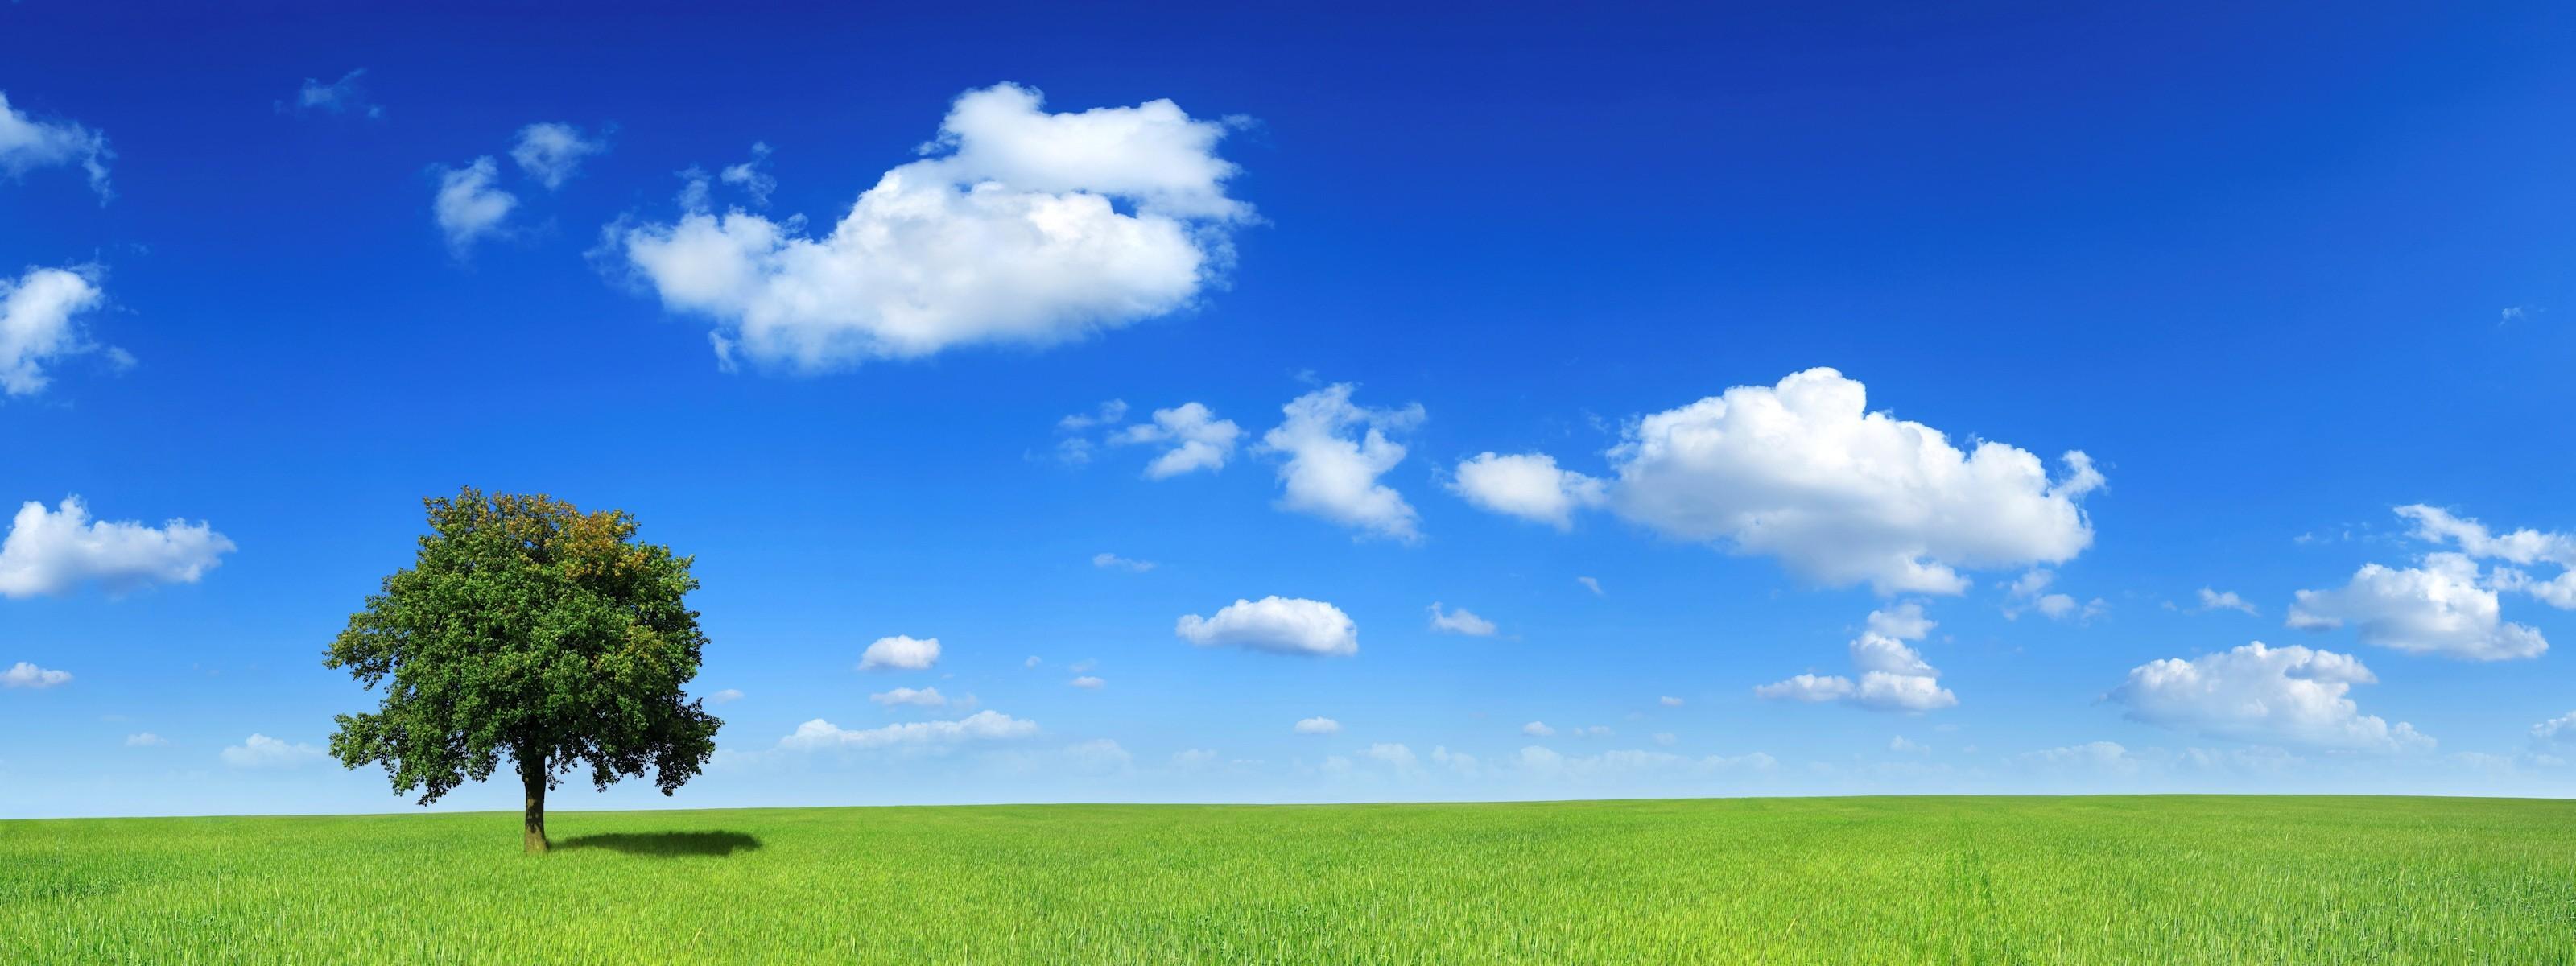 природа поле холм облака небо трава nature field hill clouds the sky grass скачать